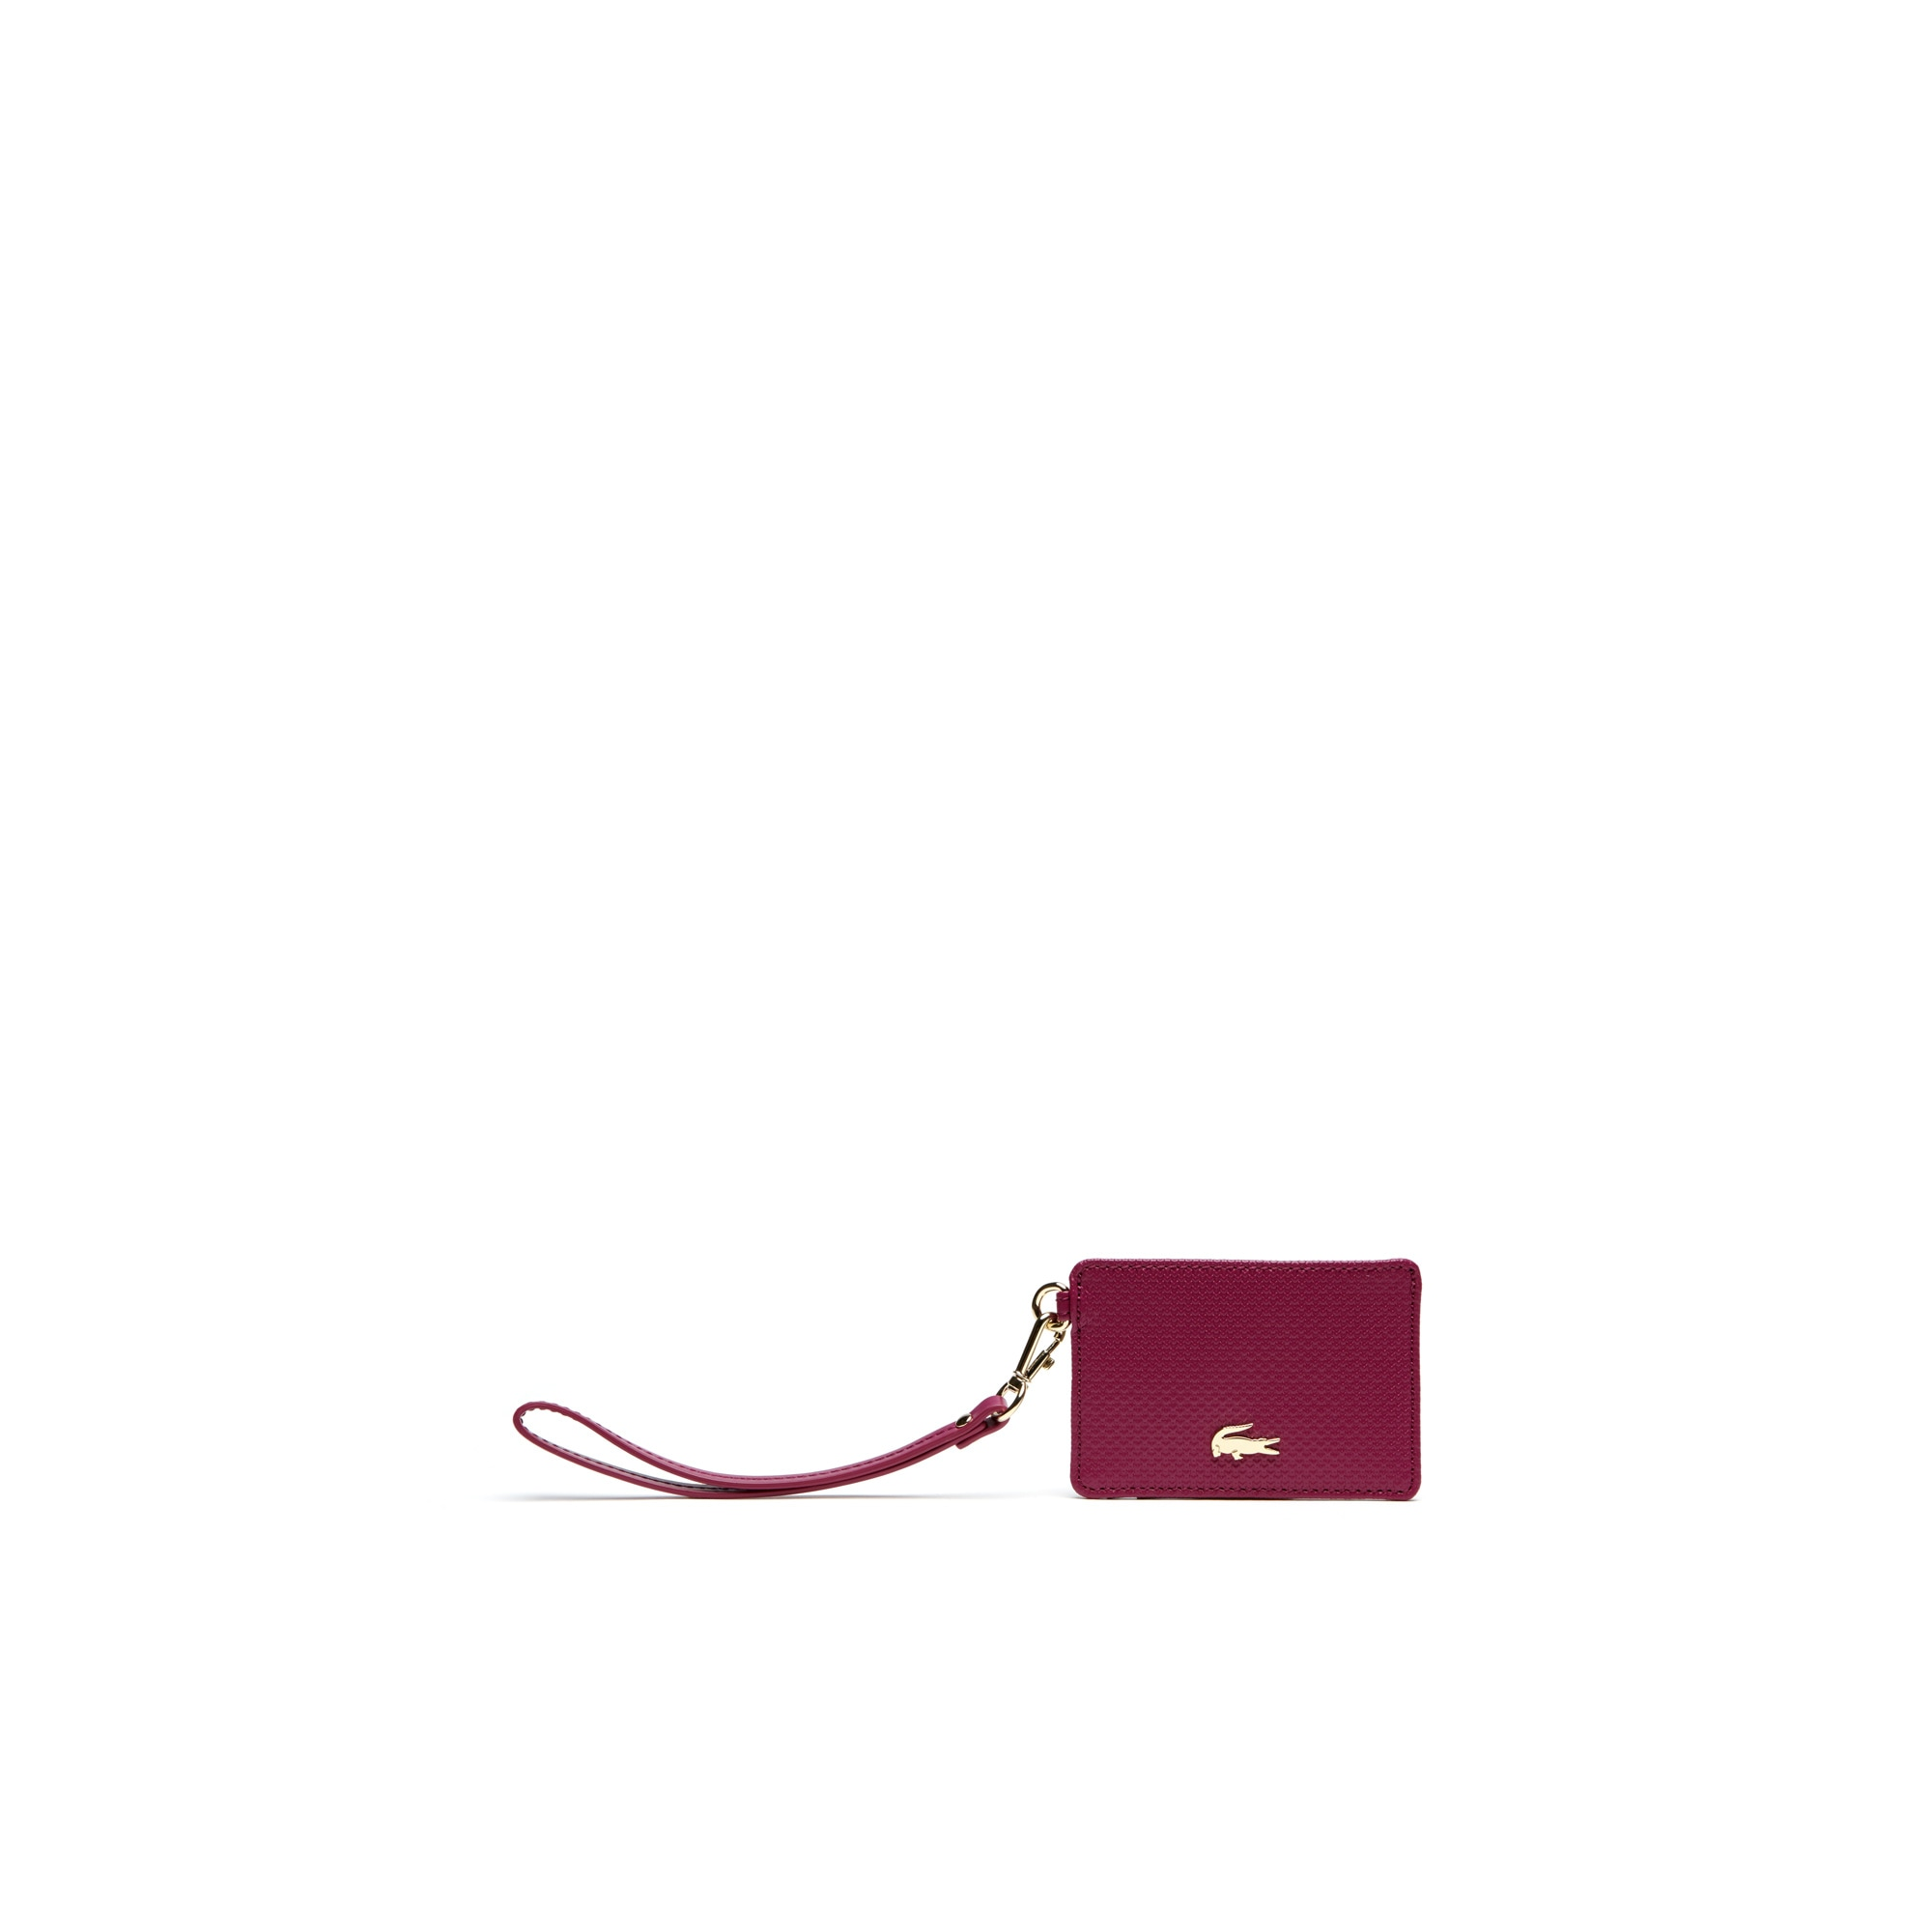 Porta carte di credito Chantaco in pelle tinta unita